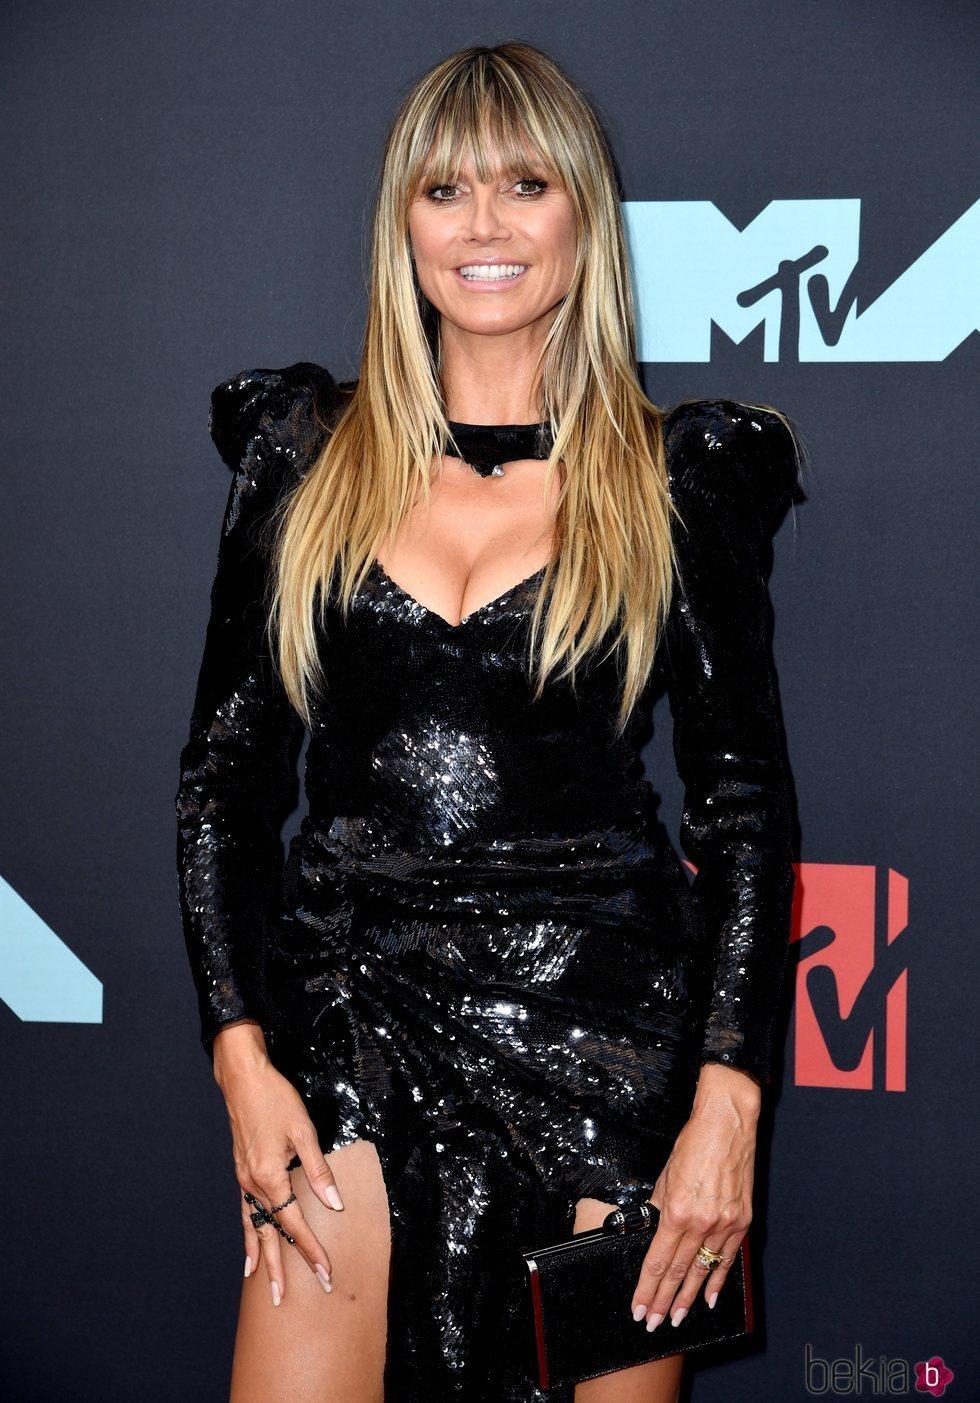 Heidi Klum en los MTV VMAs 2019